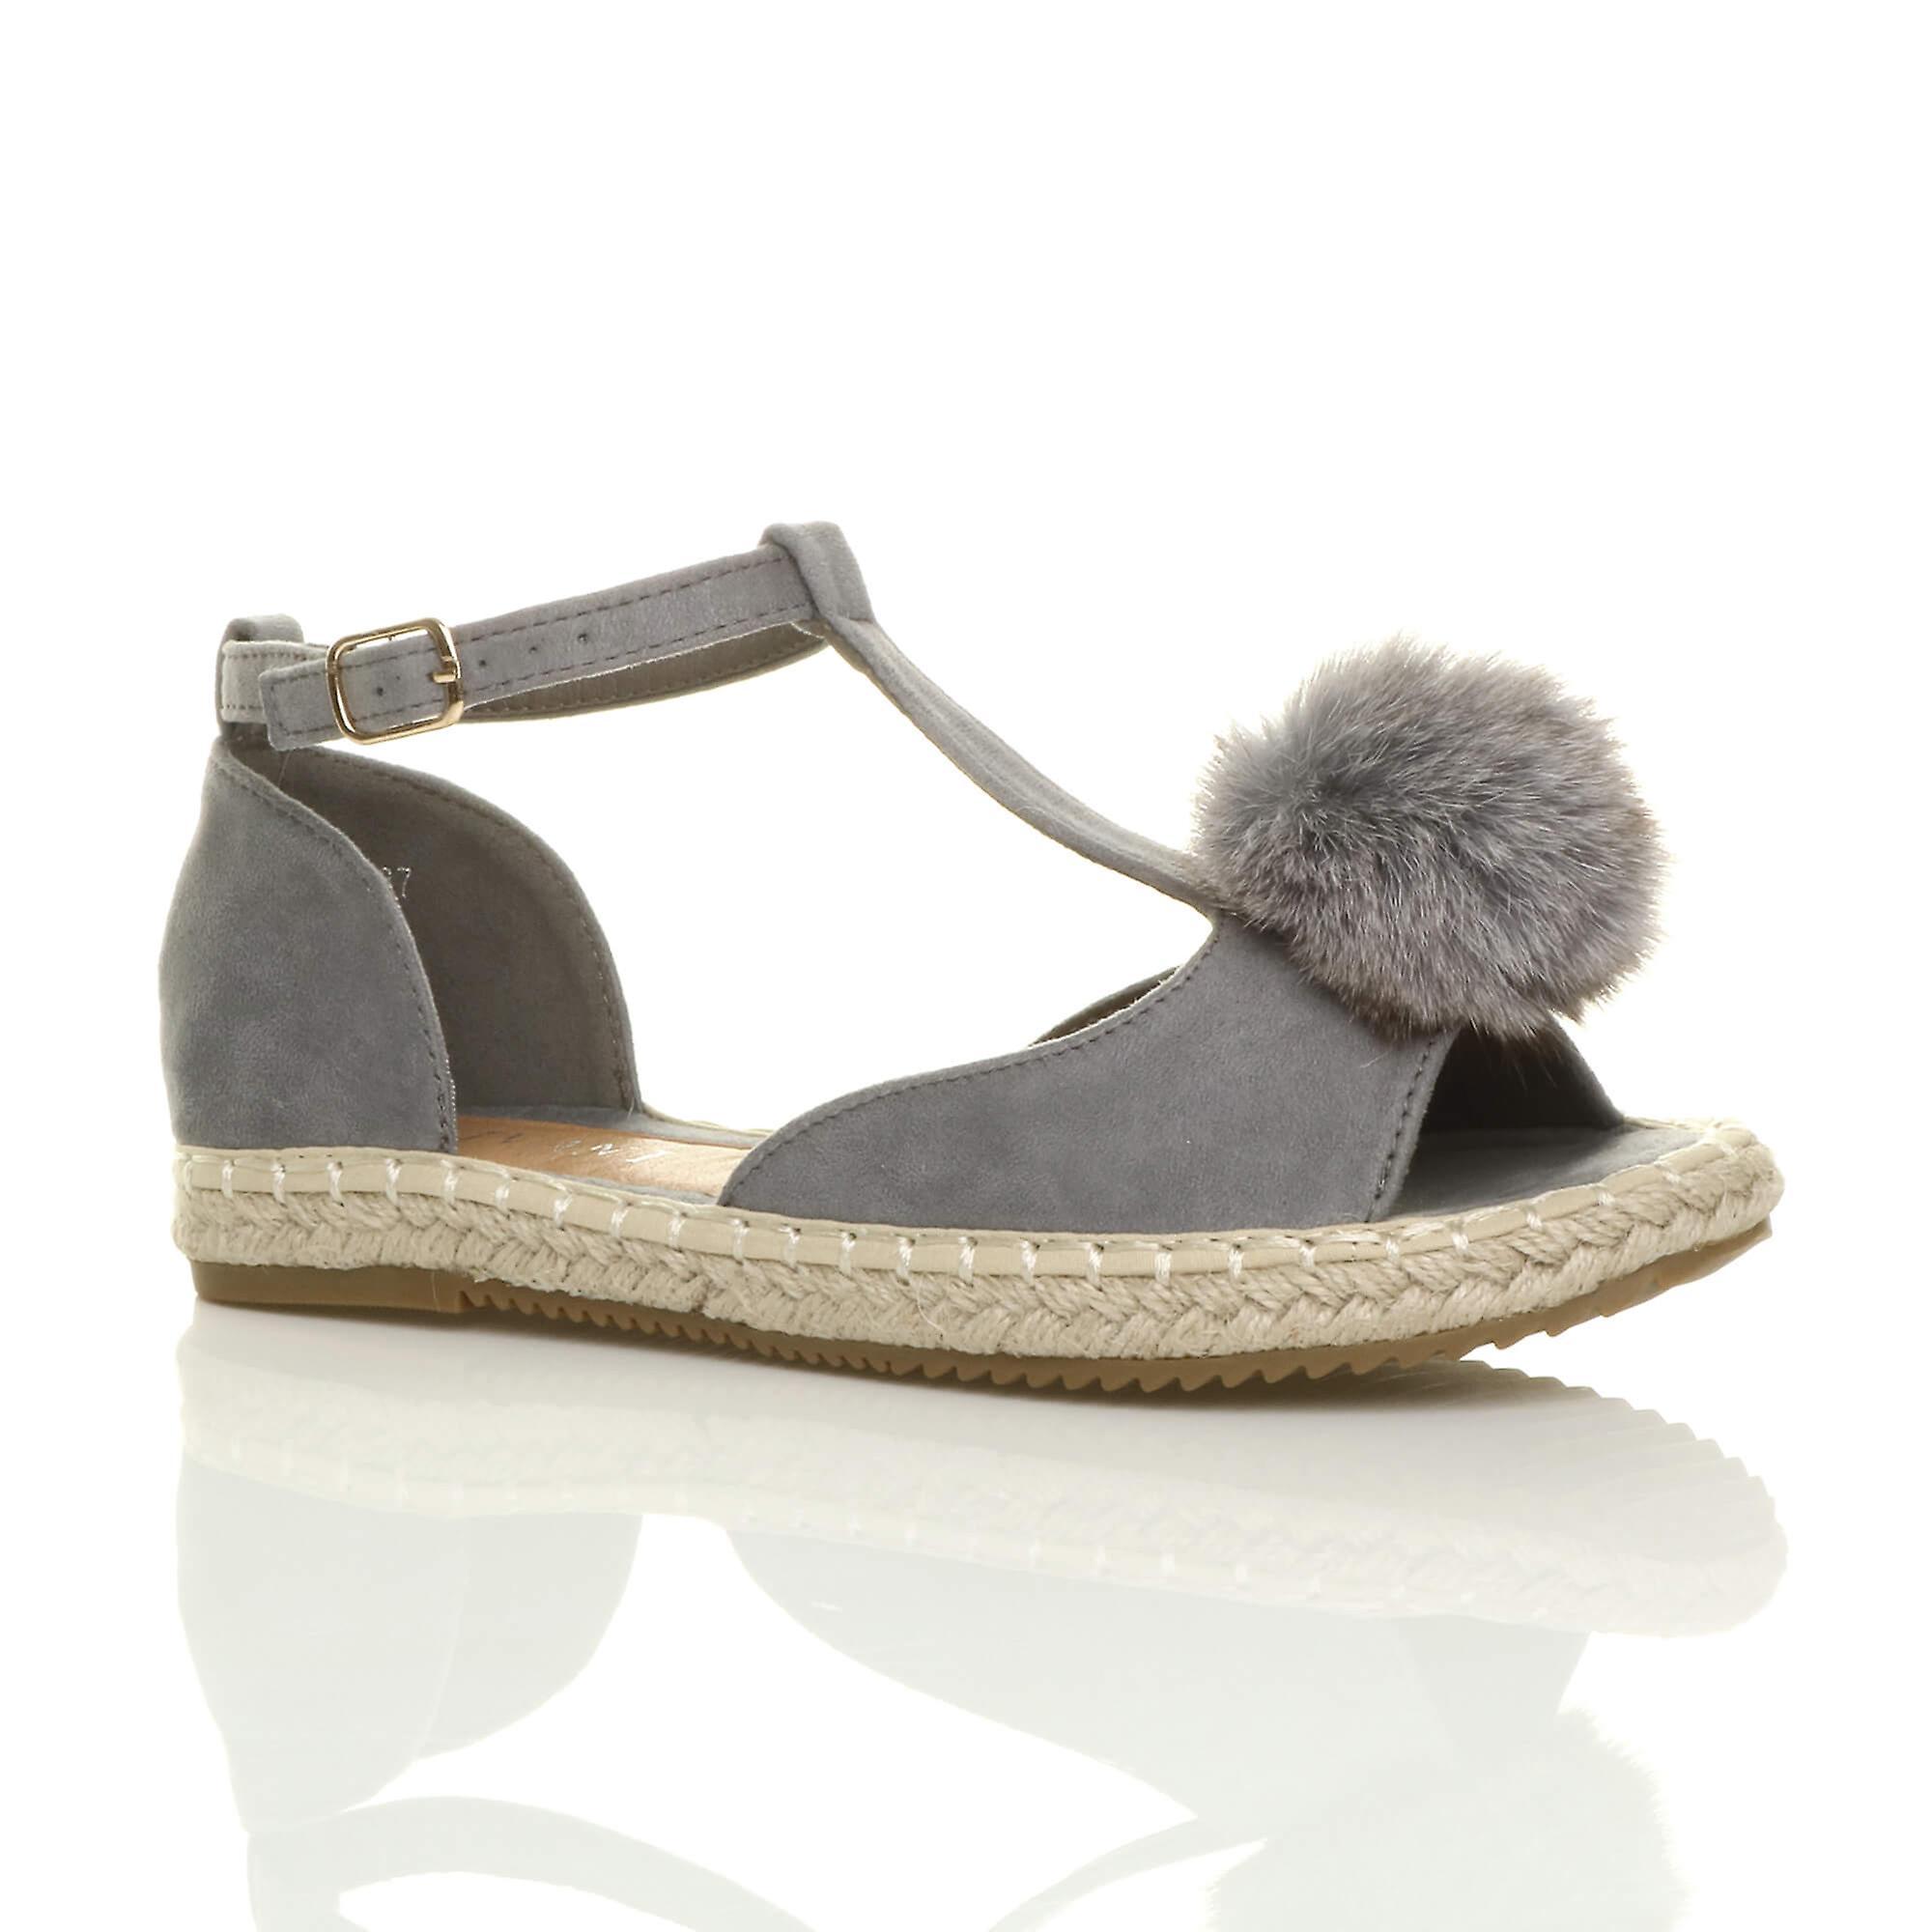 Ajvani donne piatta t-bar pom - - - pom fibbia peep toe scarpe espadrillas sandali. | Prezzo speciale  0f030f